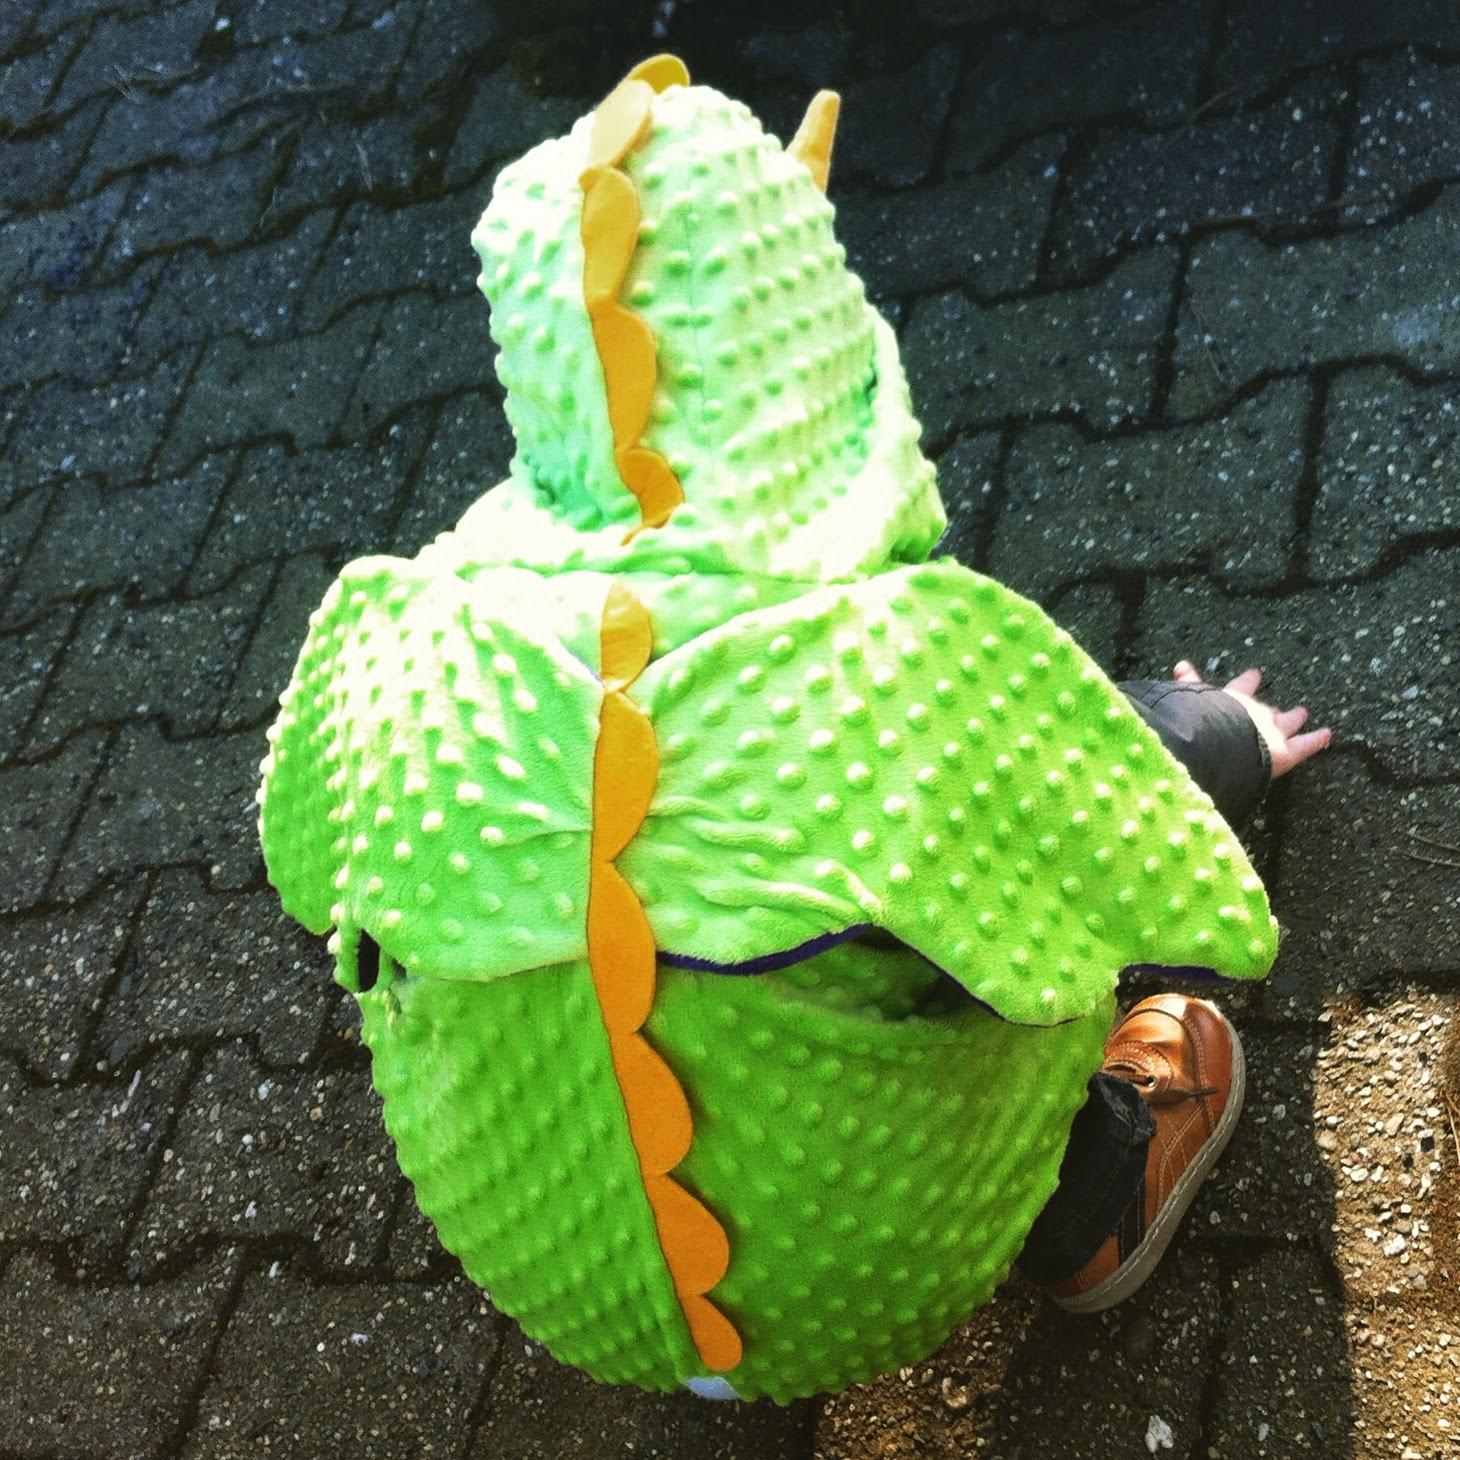 Zwuggel im Drachen-Kostüm